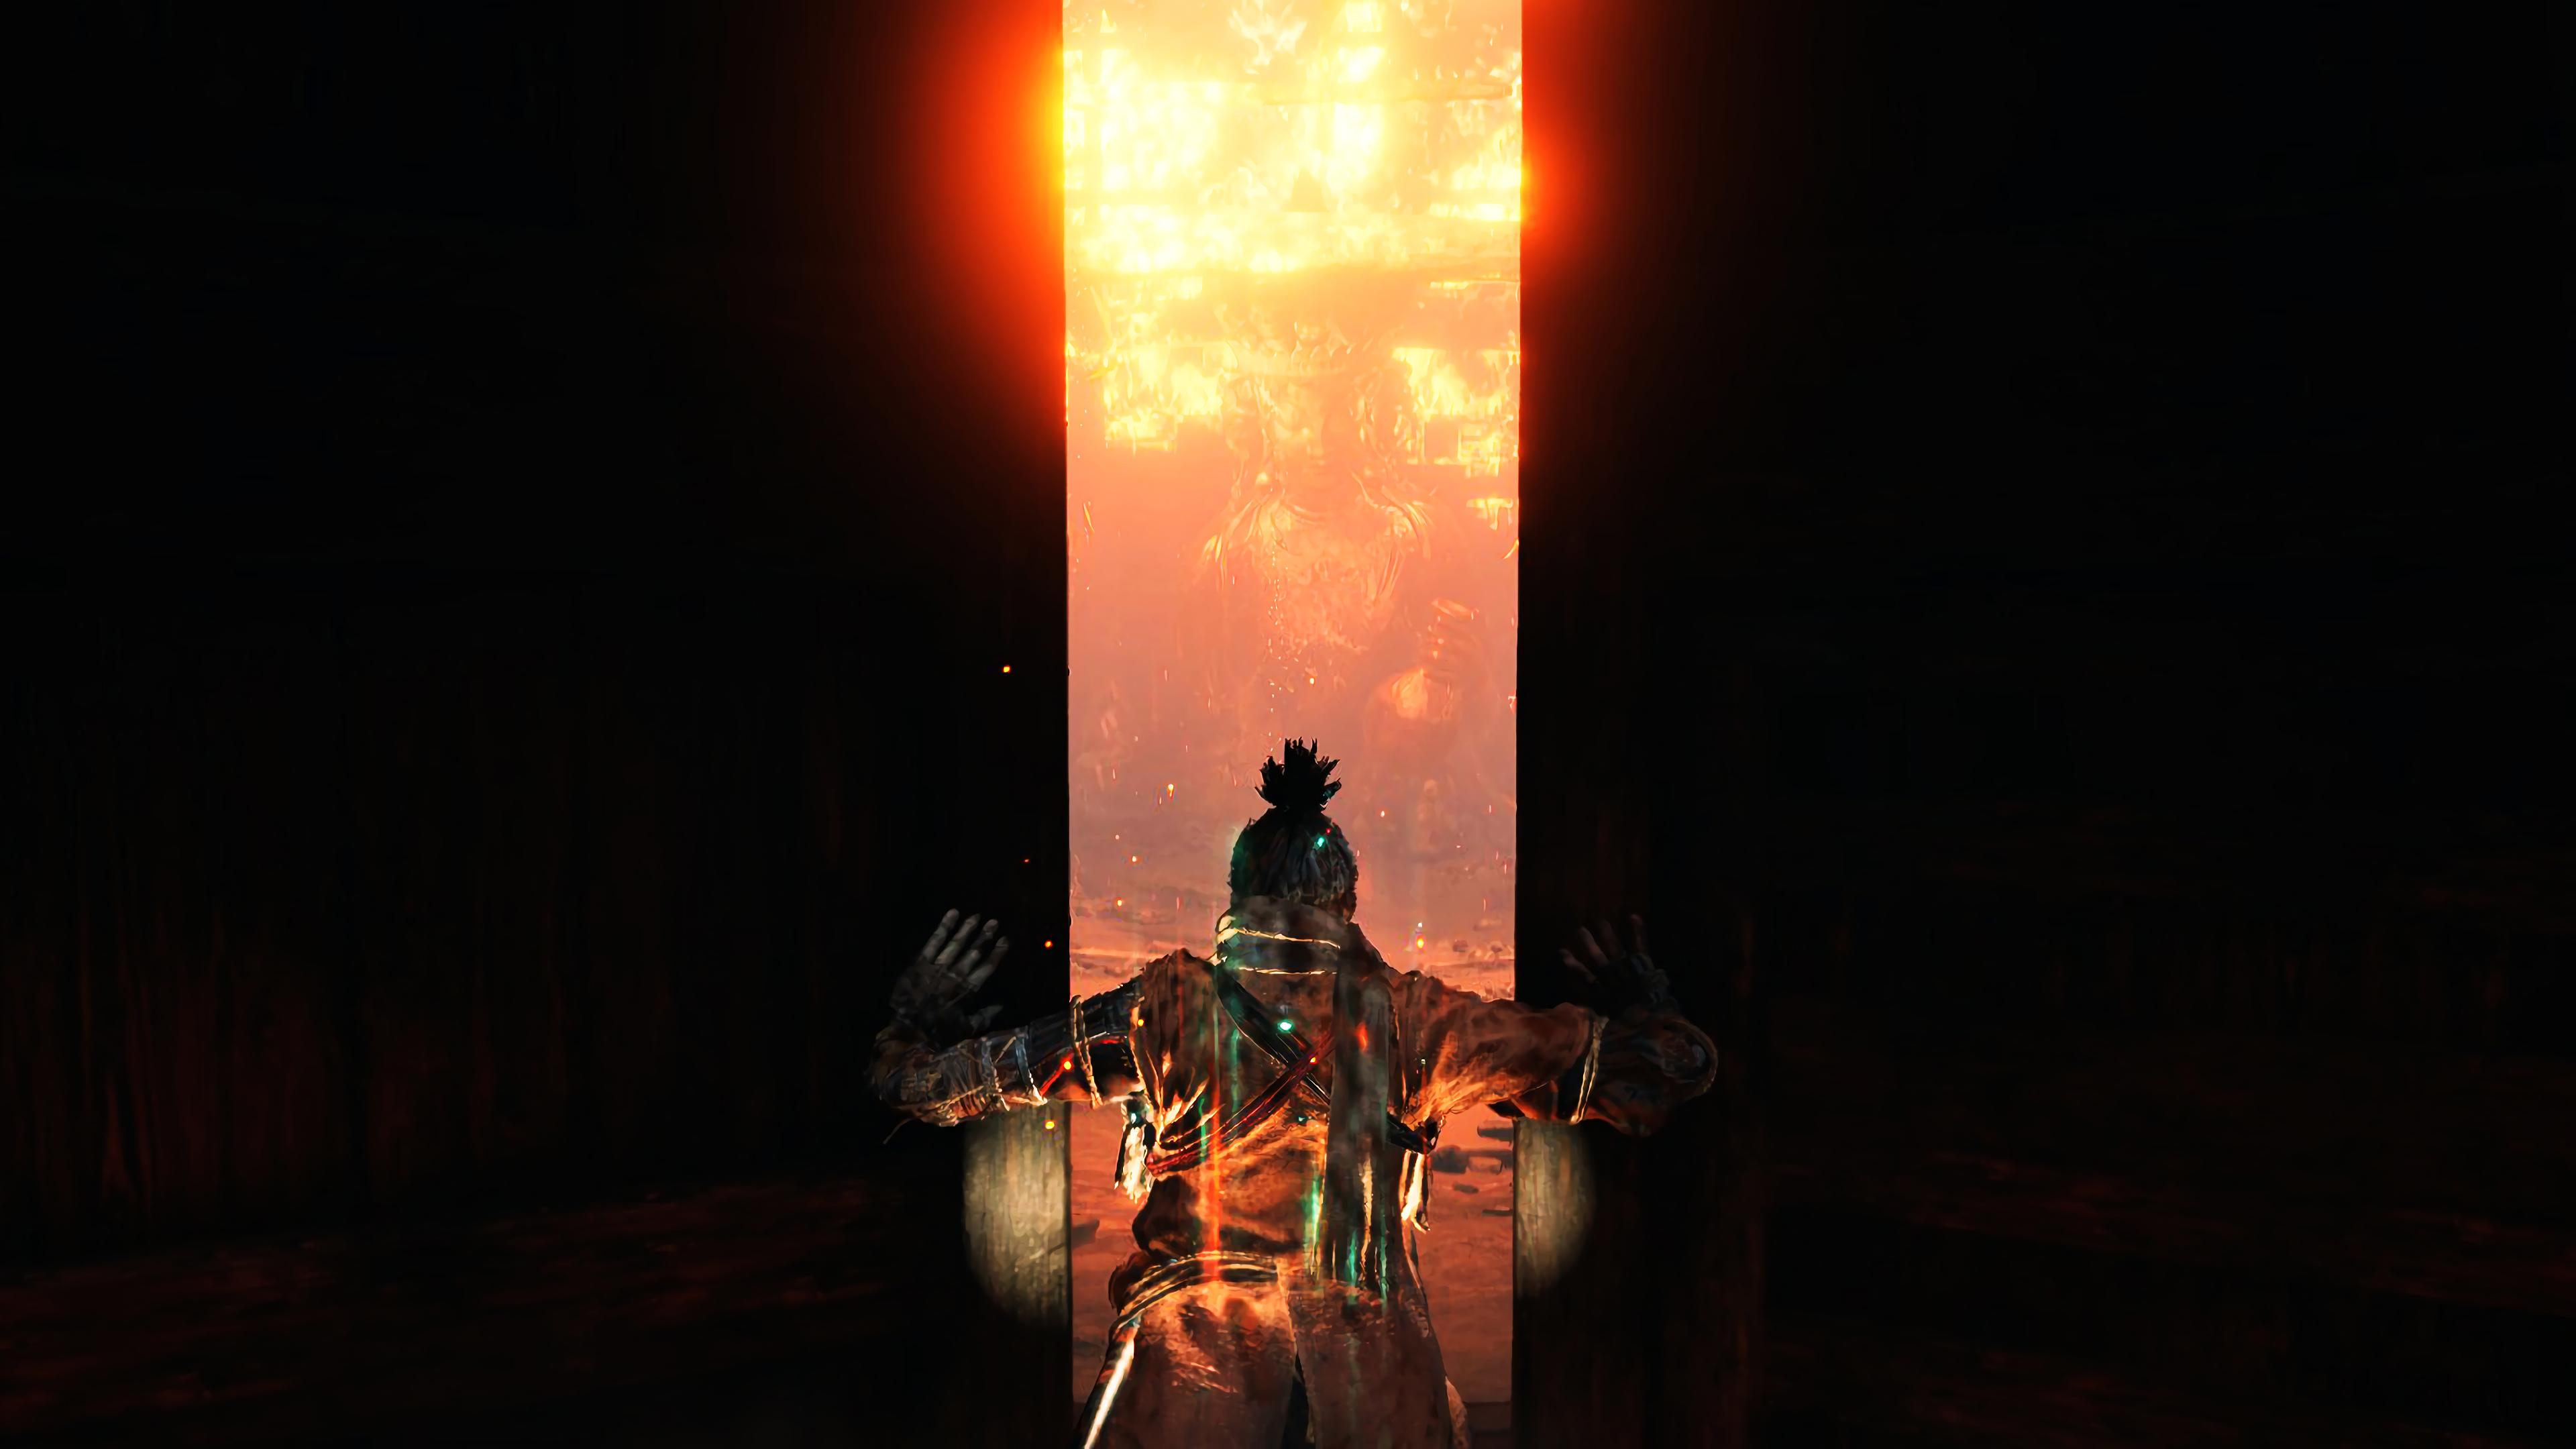 4k Sekiro Shadows Die Twice Door Opening Wallpaper Hd Games 4k